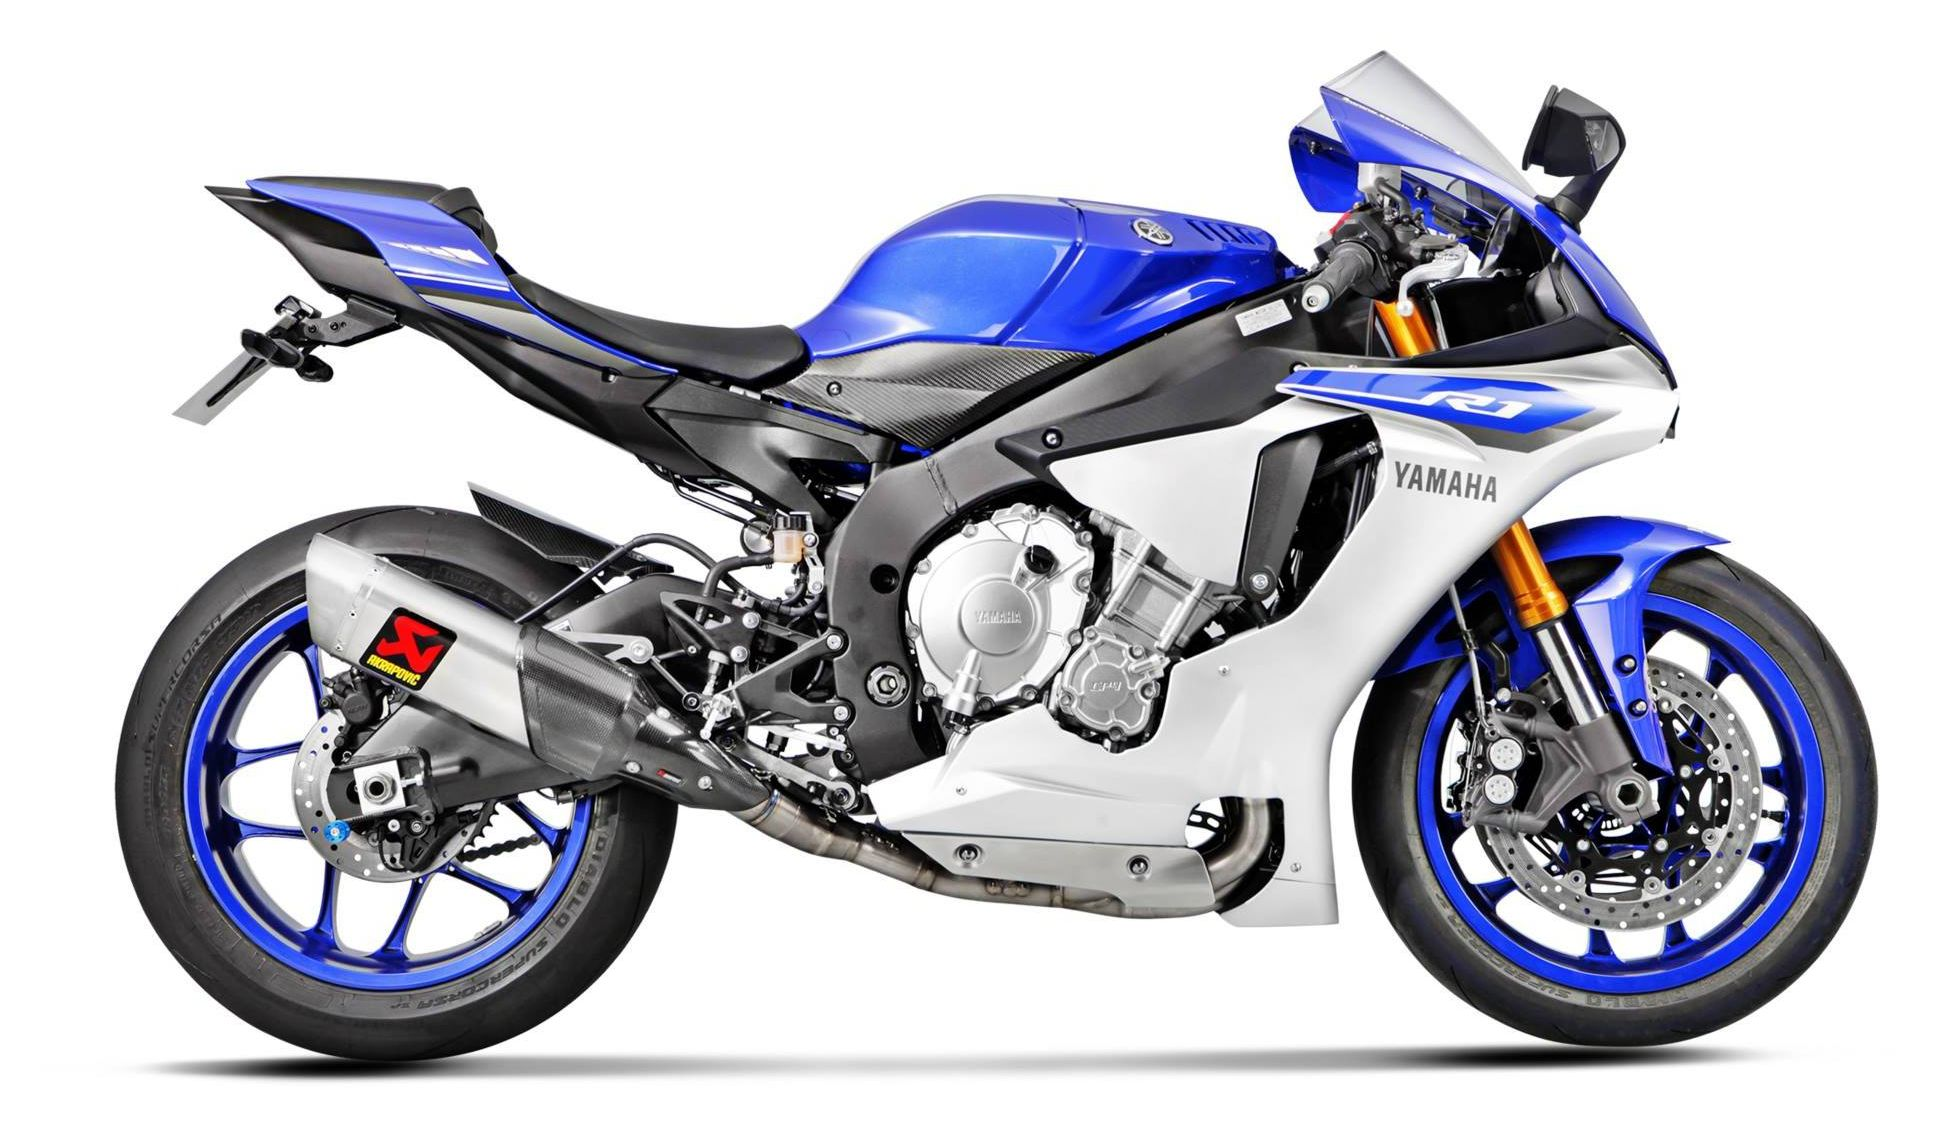 Akrapovic Evolution GP Exhaust System Yamaha R1 R1M 2015 2018